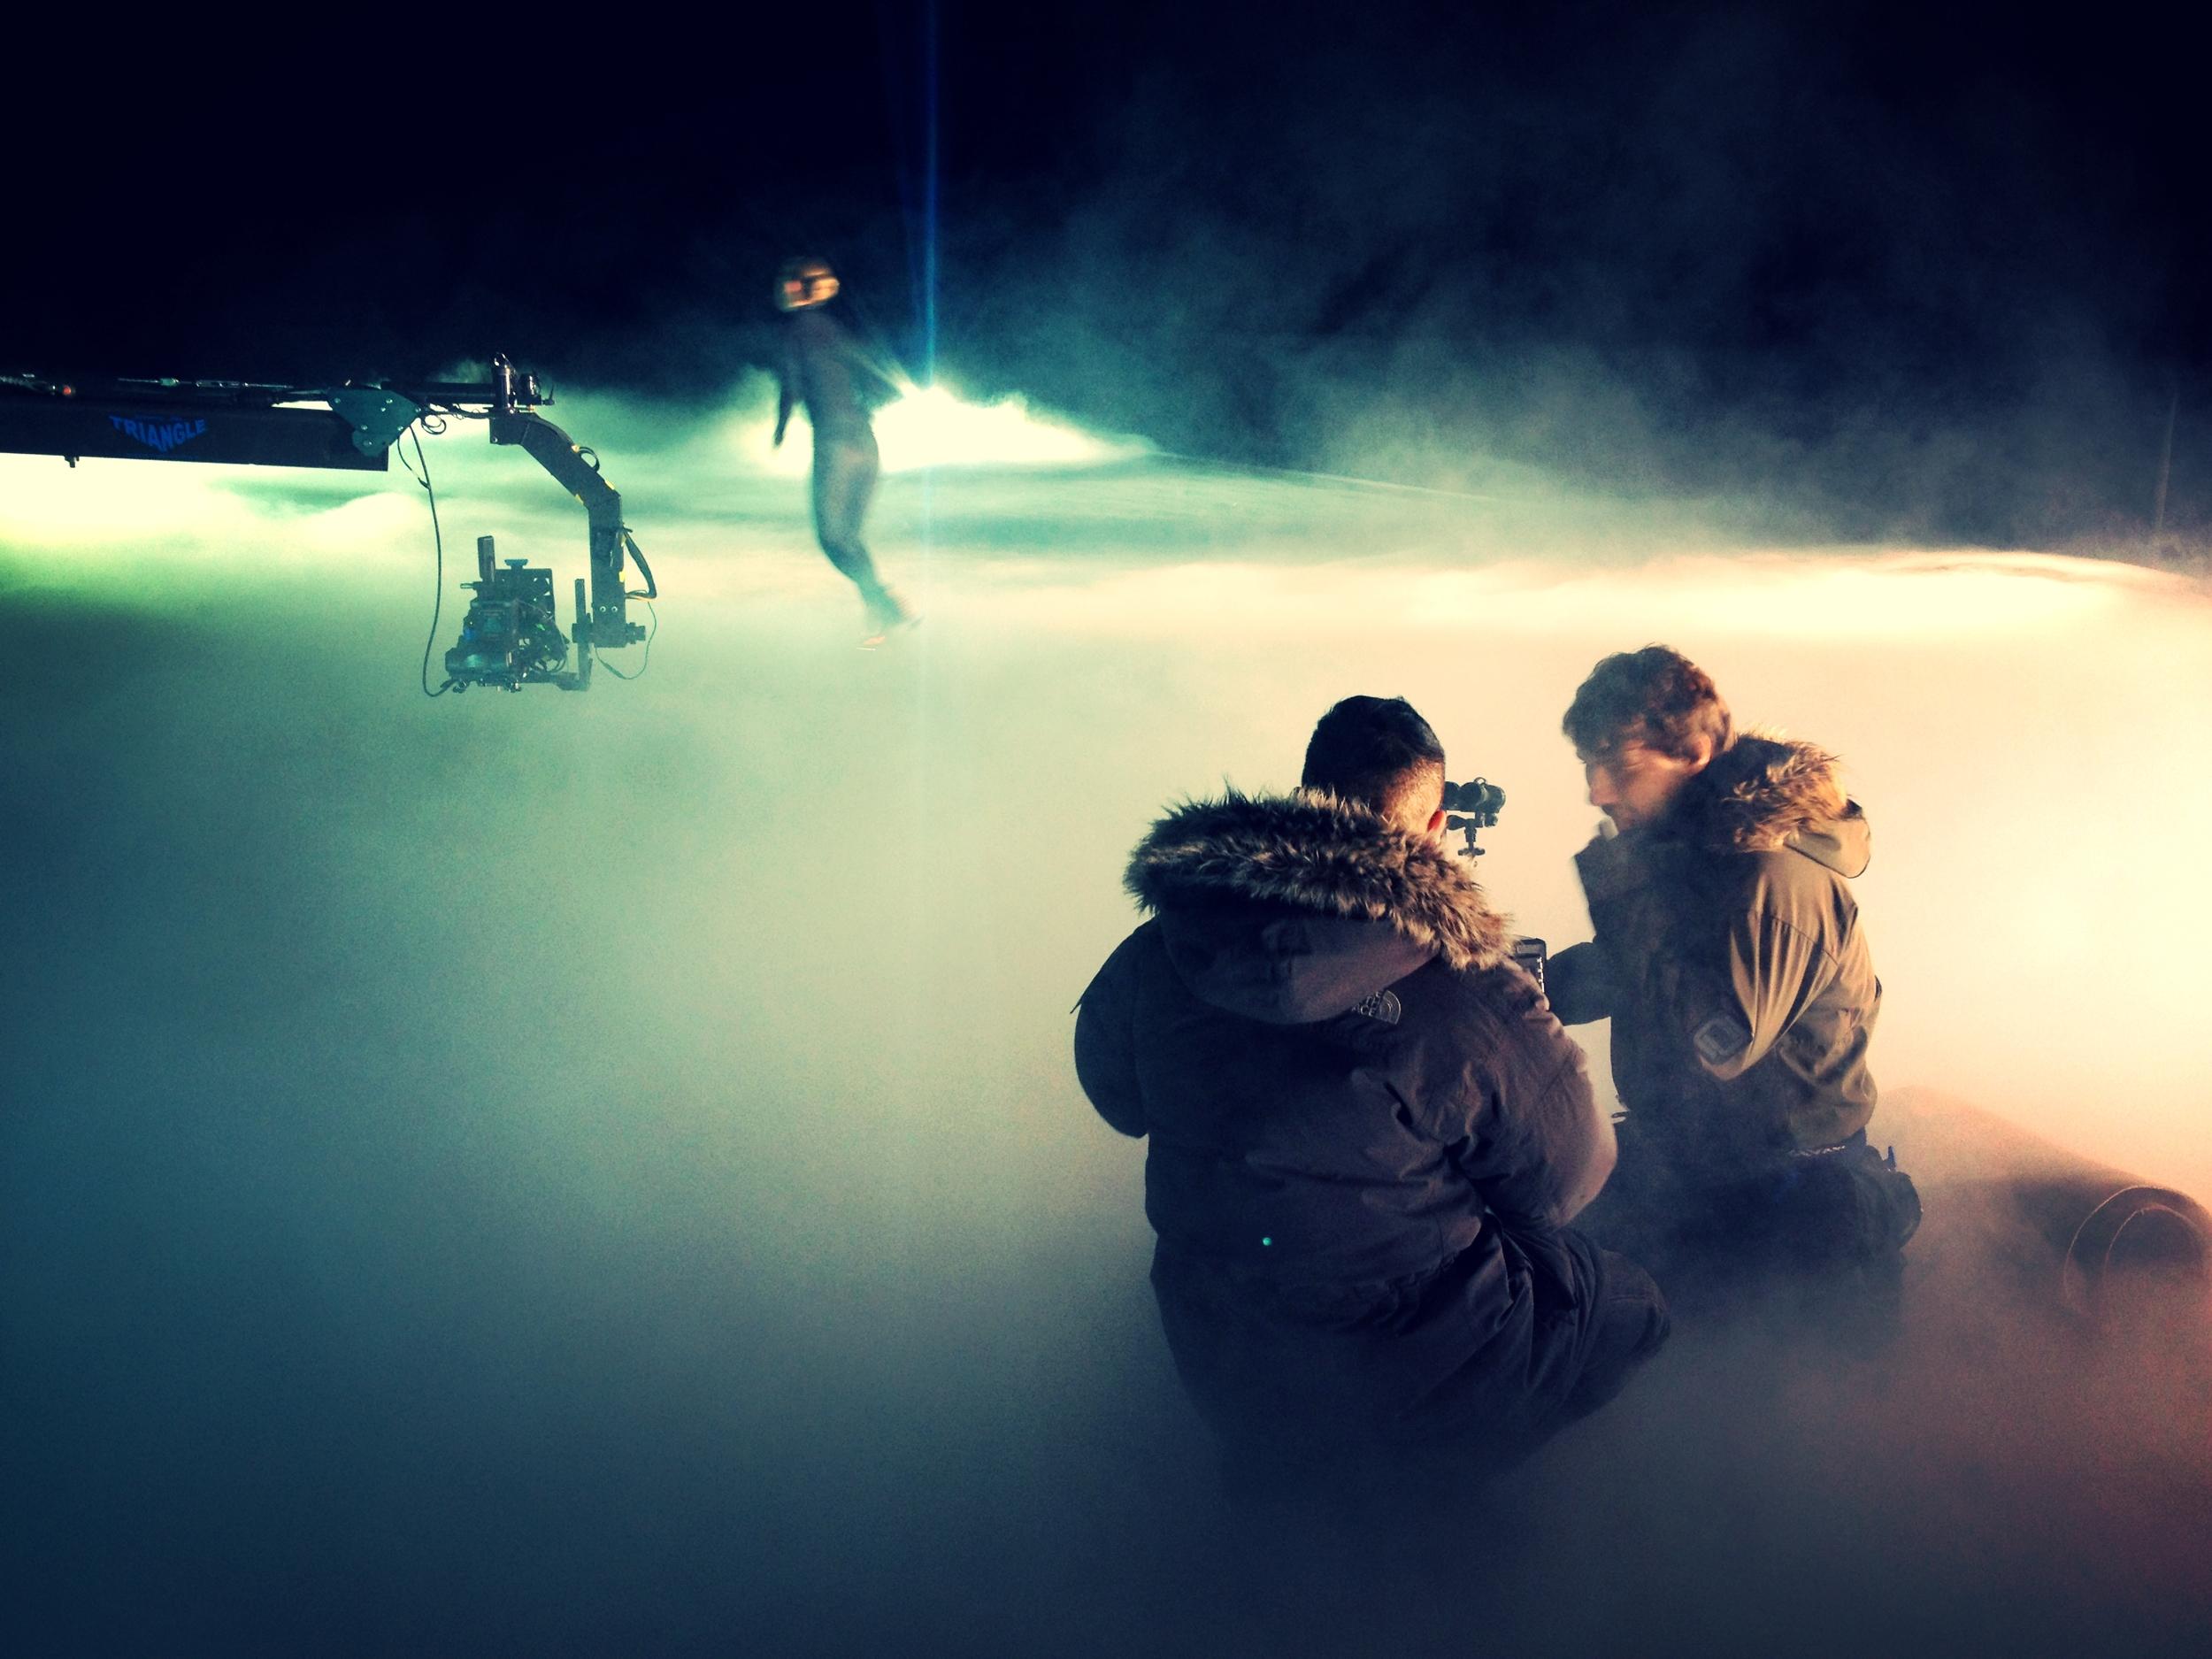 Dancing on Ice Idents Richard Cornelius - Director of Photography